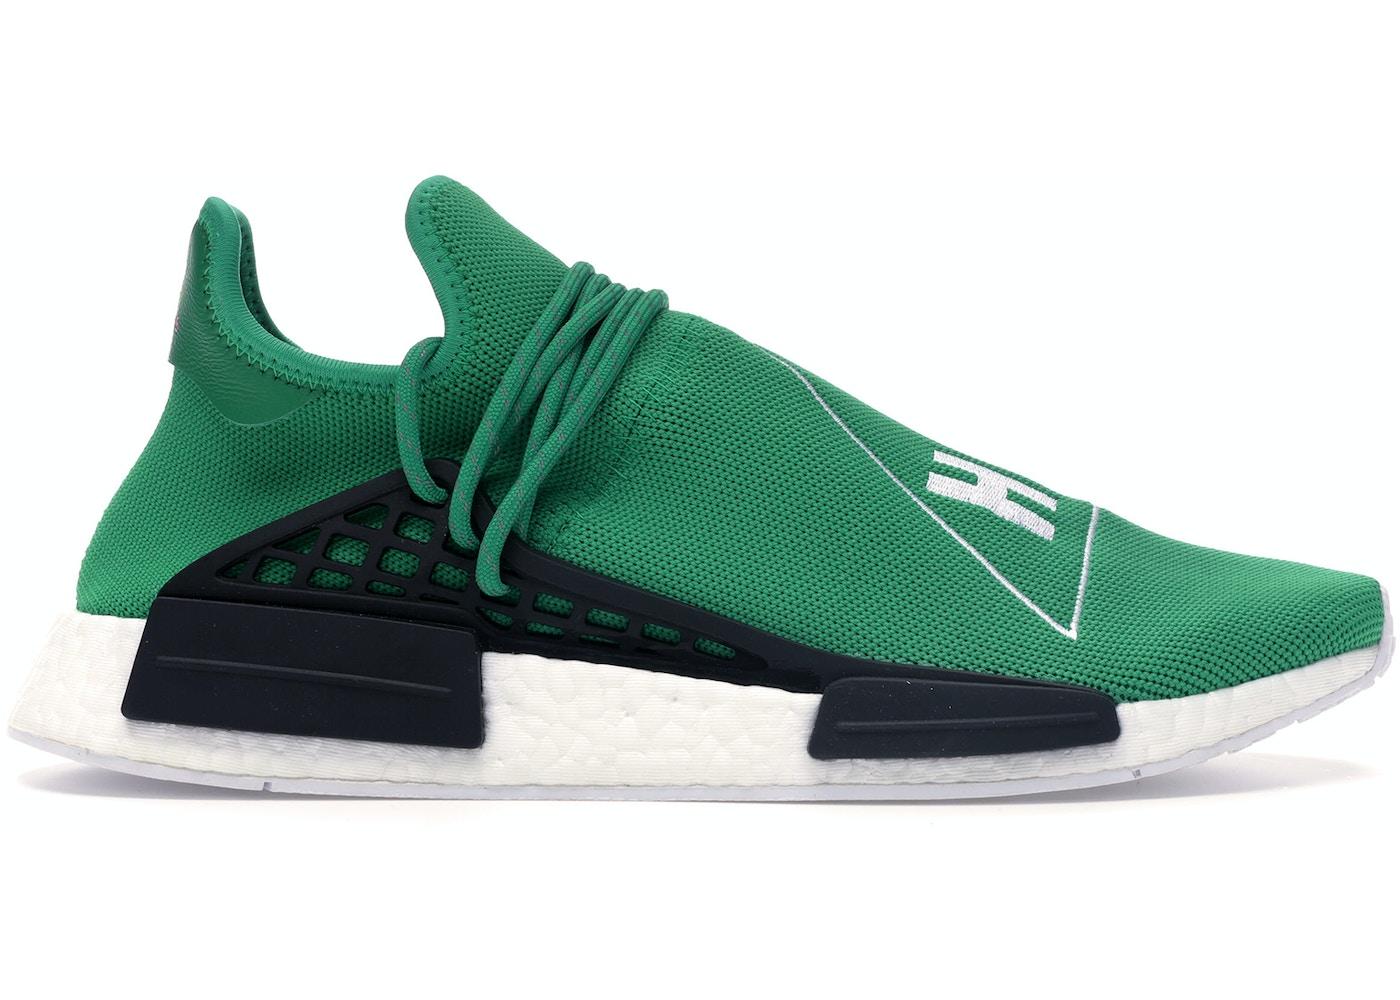 2e1e74dbf108d adidas NMD R1 Pharrell HU Green - BB0620